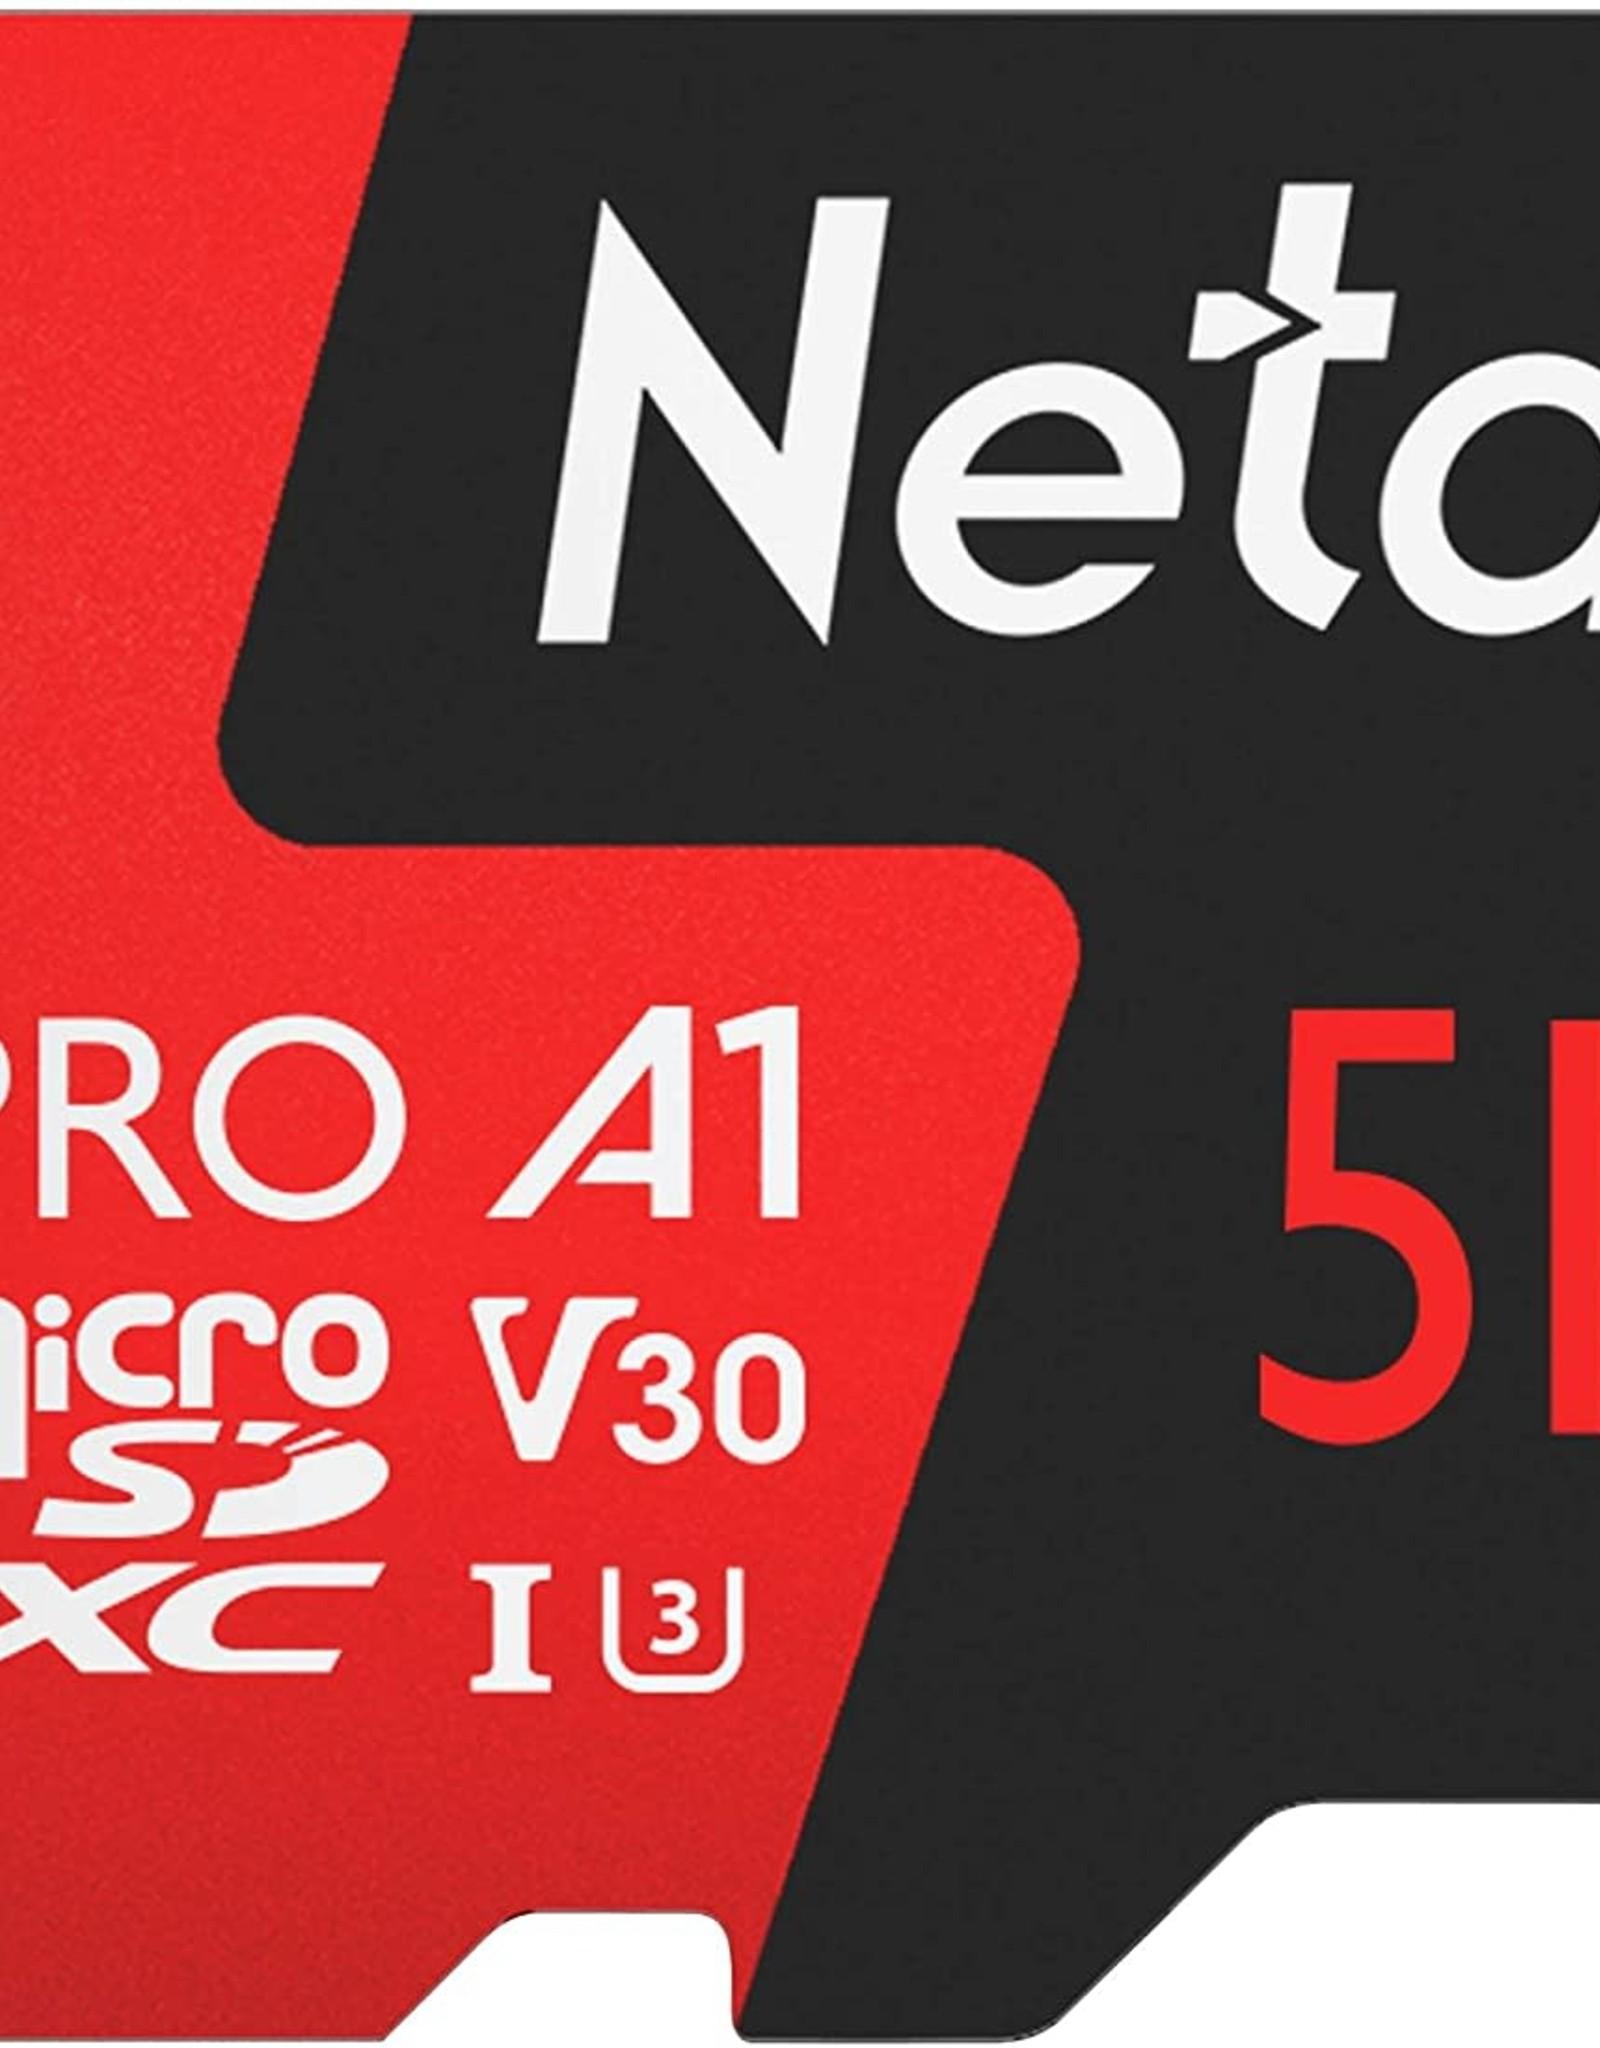 Netac 512GB P500 Pro microSDXC CL10 UHS-I U3 V30 A1 Memory Card w/SD Adapter